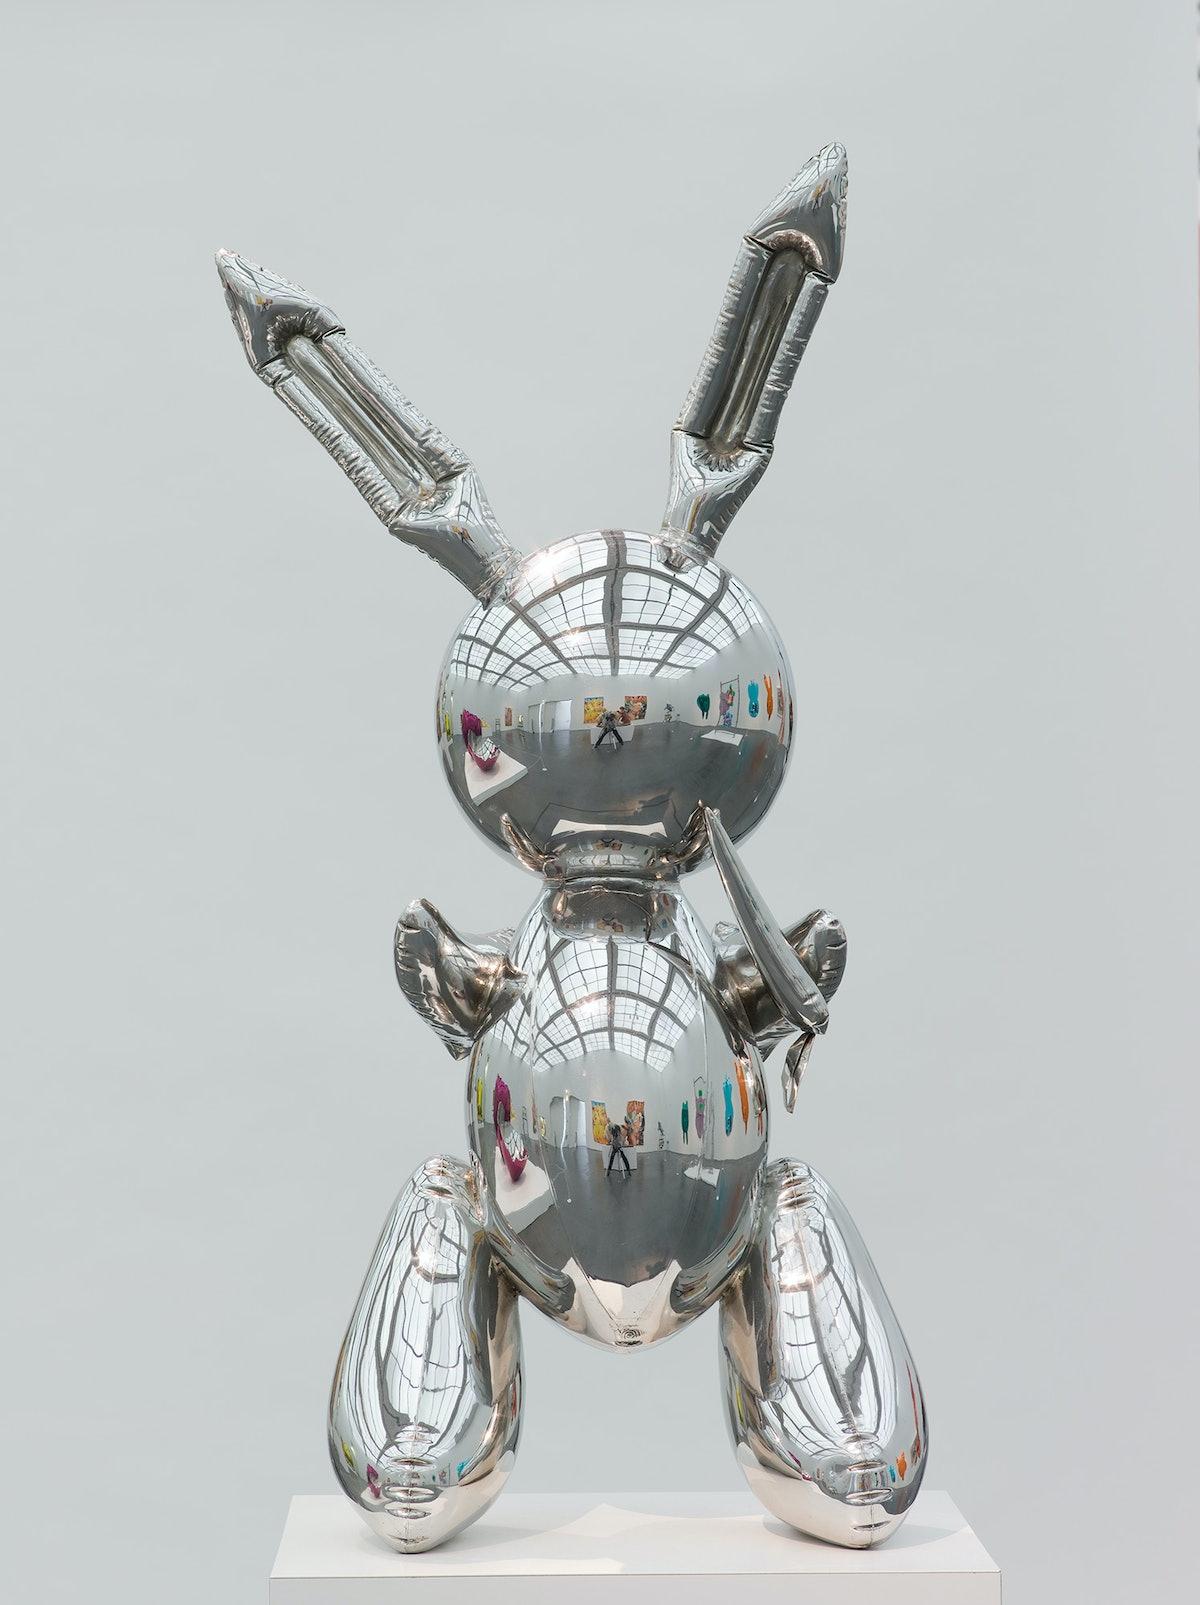 Koons-Rabbit-2000_21_v01.jpg